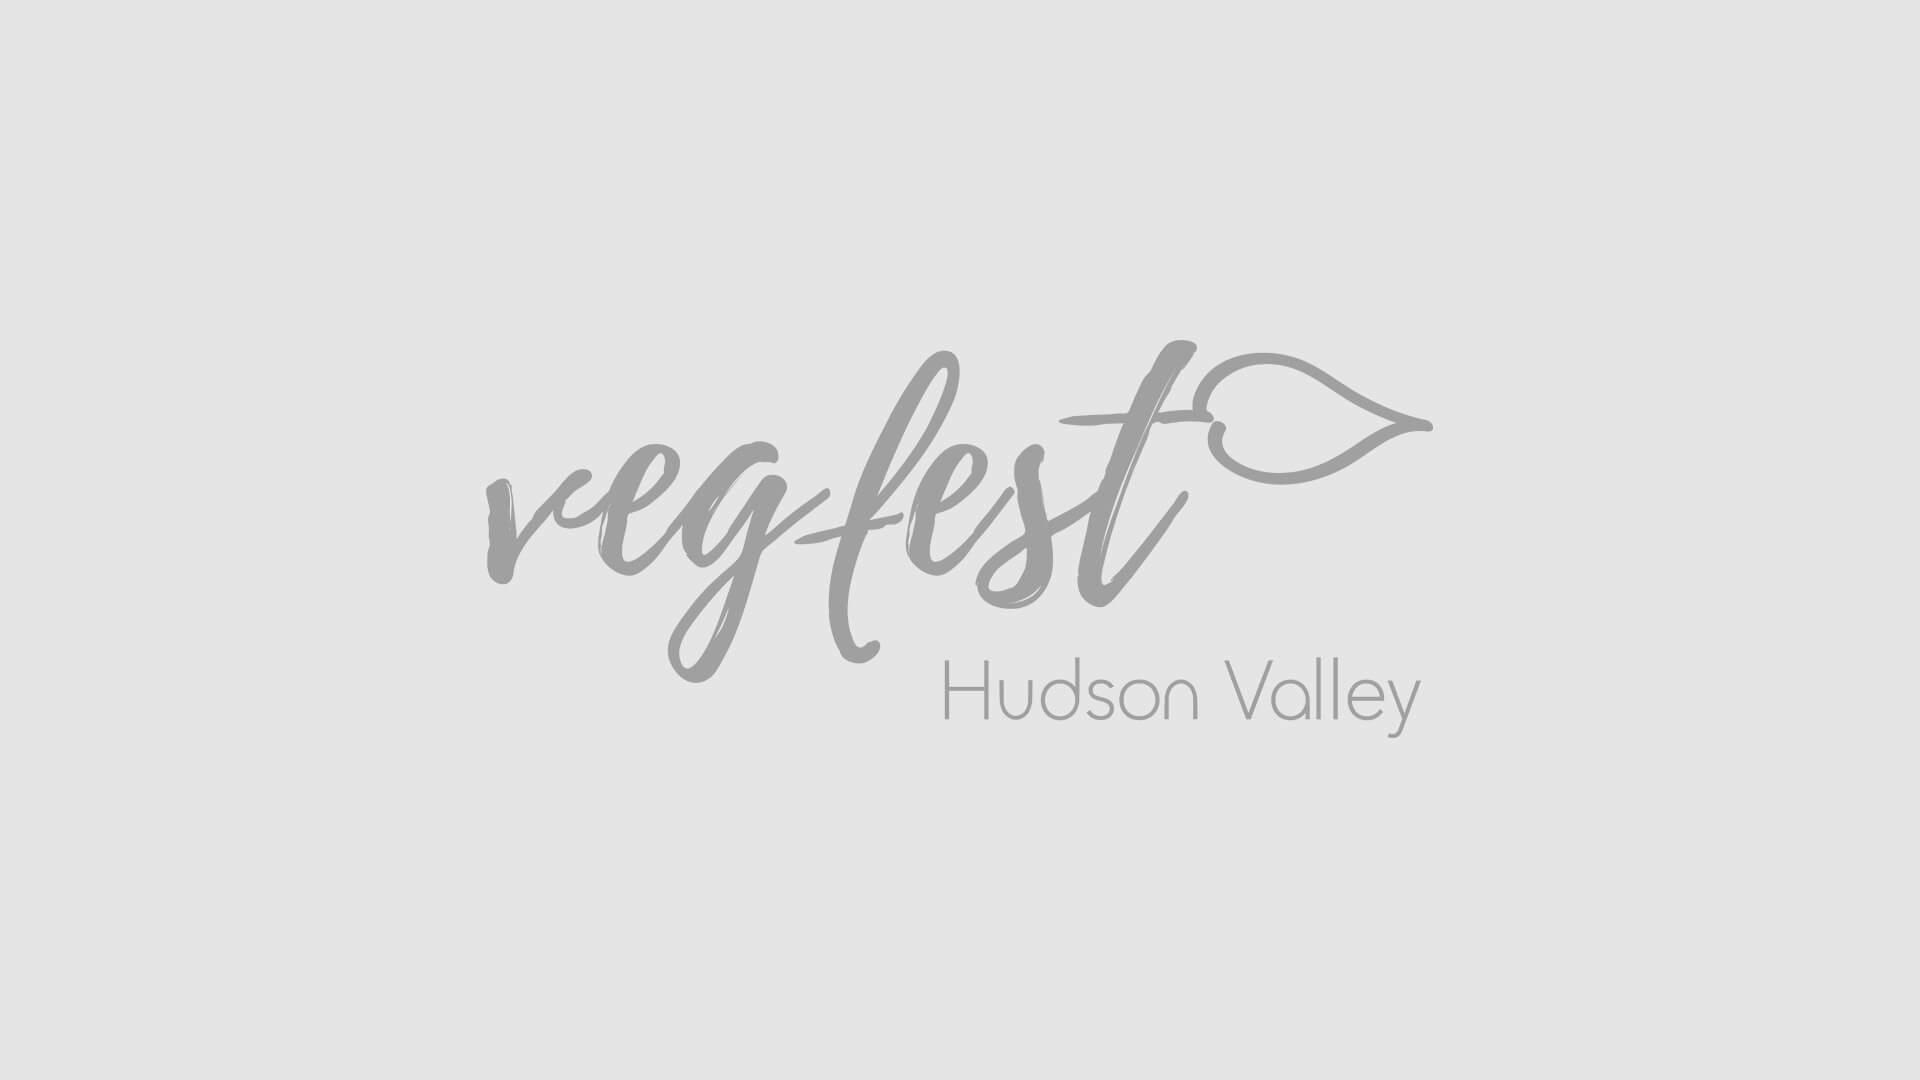 Vegfest_Logo_clean